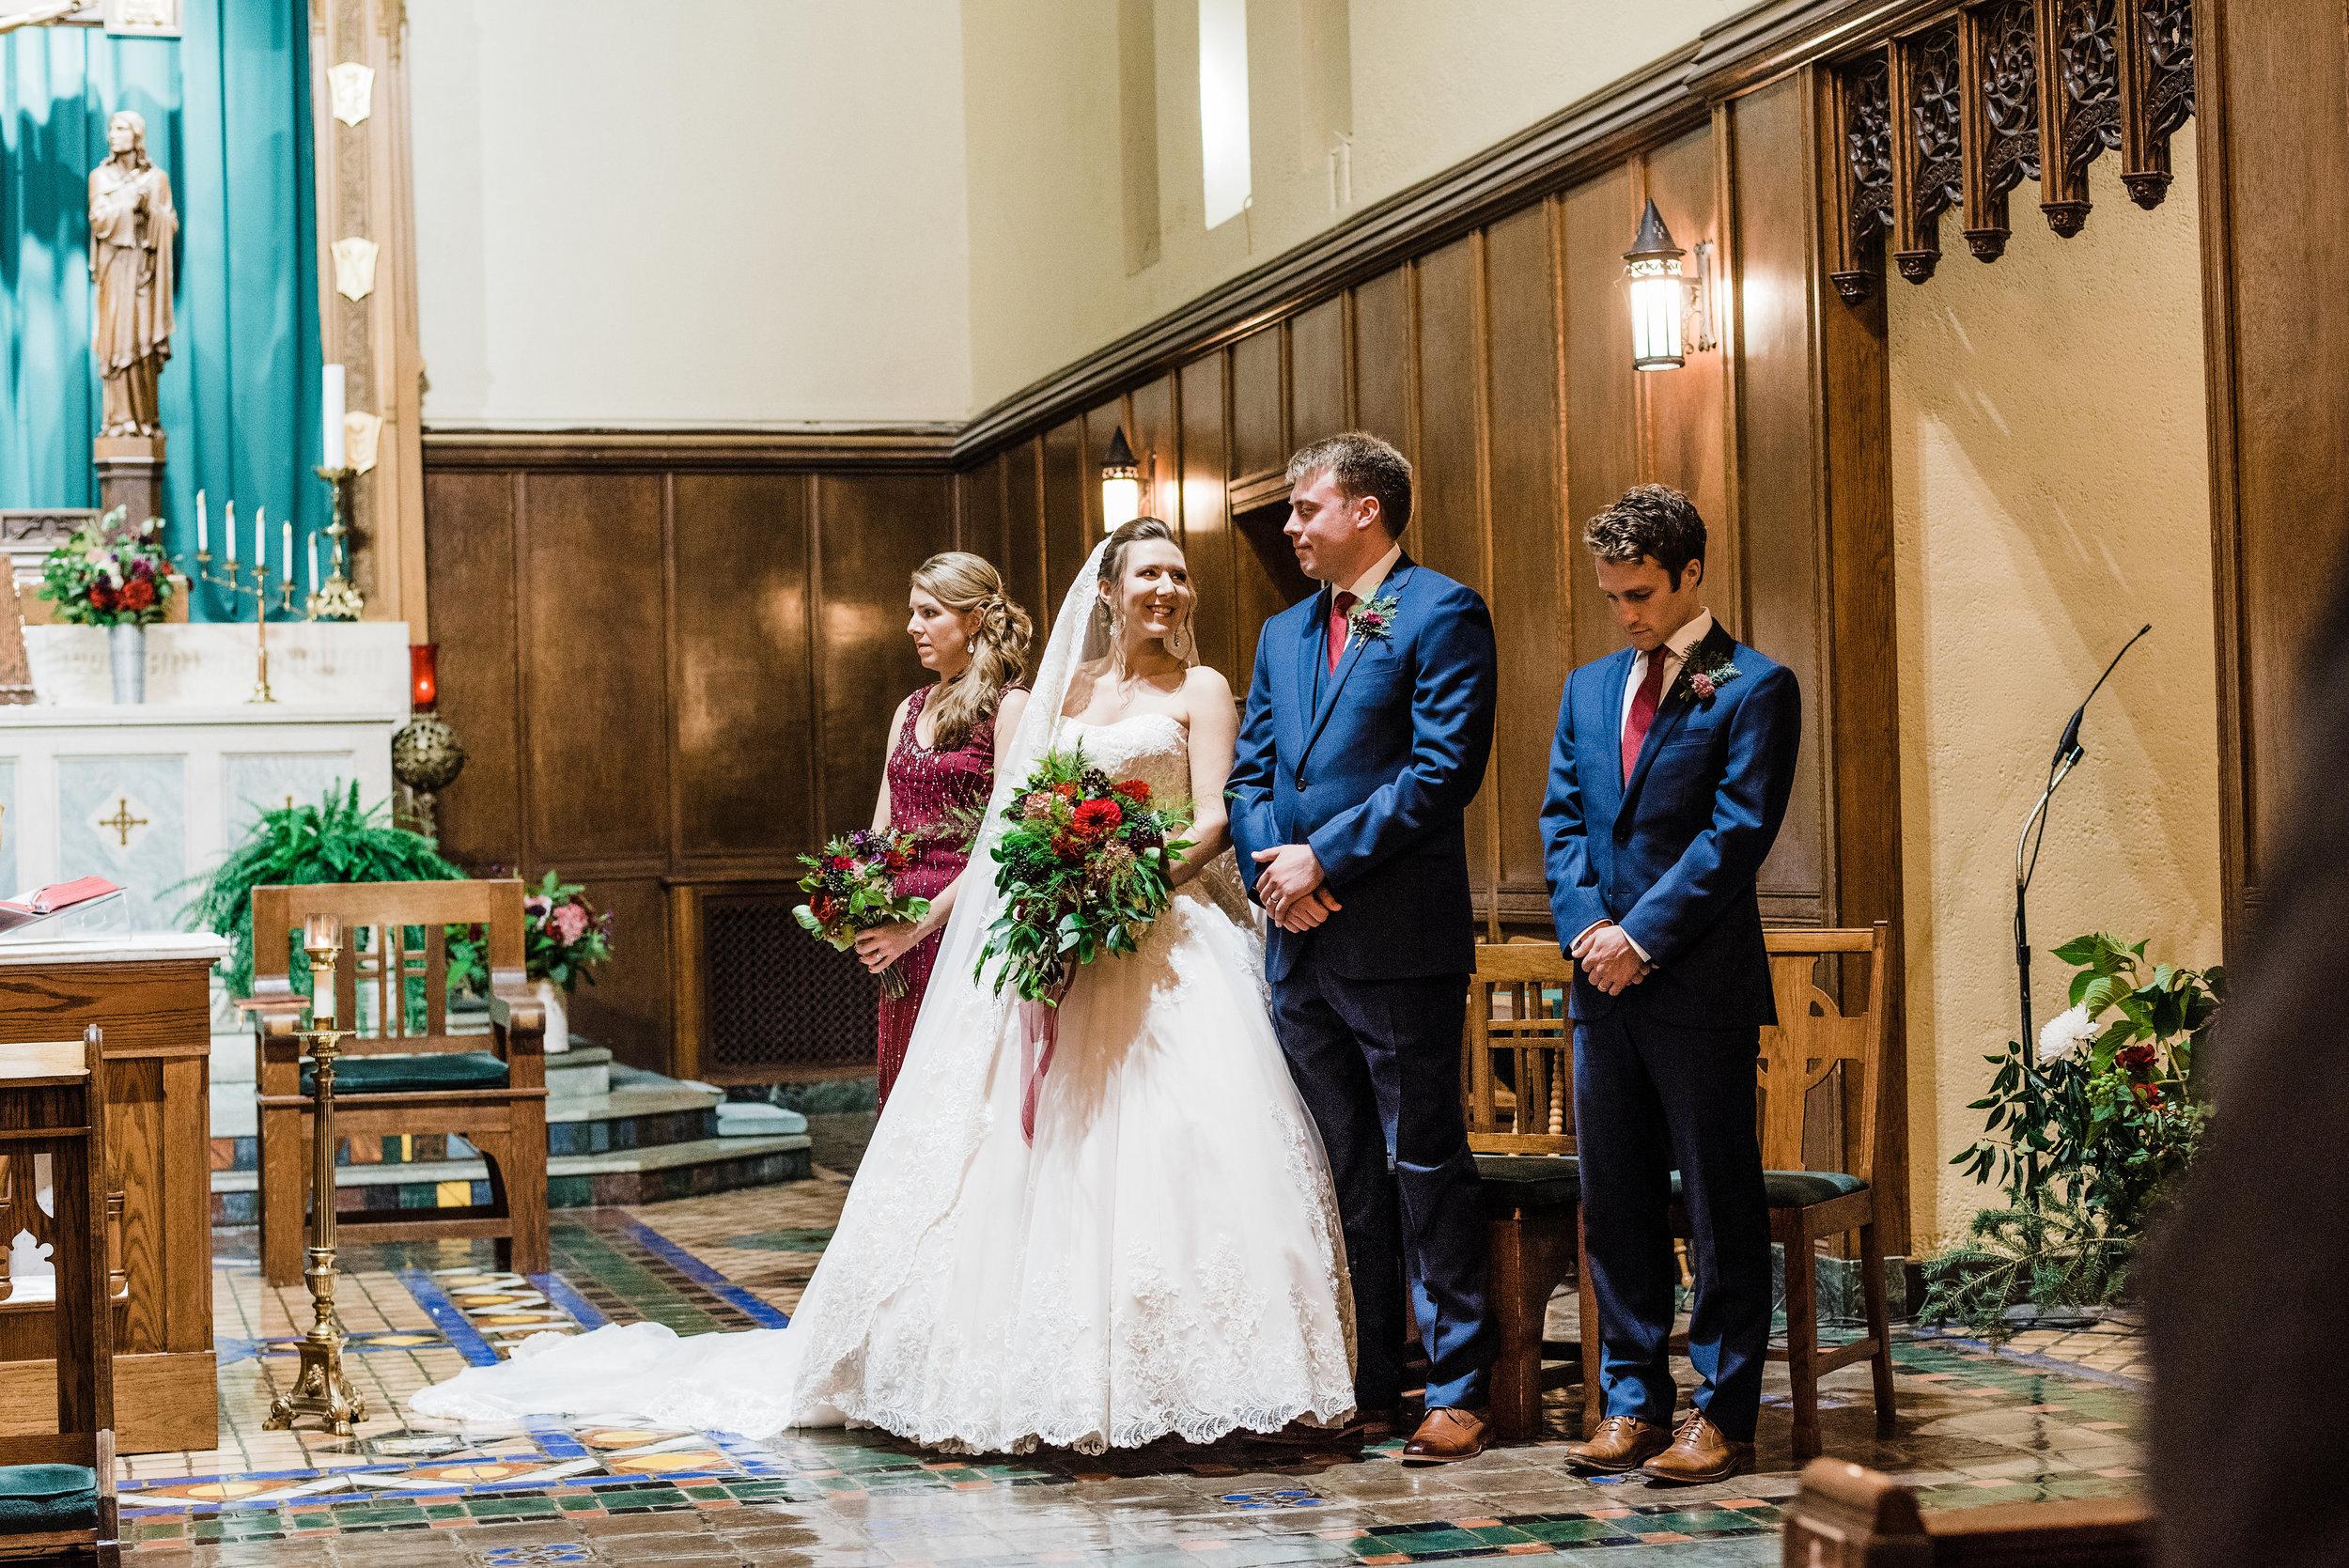 sacred_heart_church_wedding_new_york.jpg